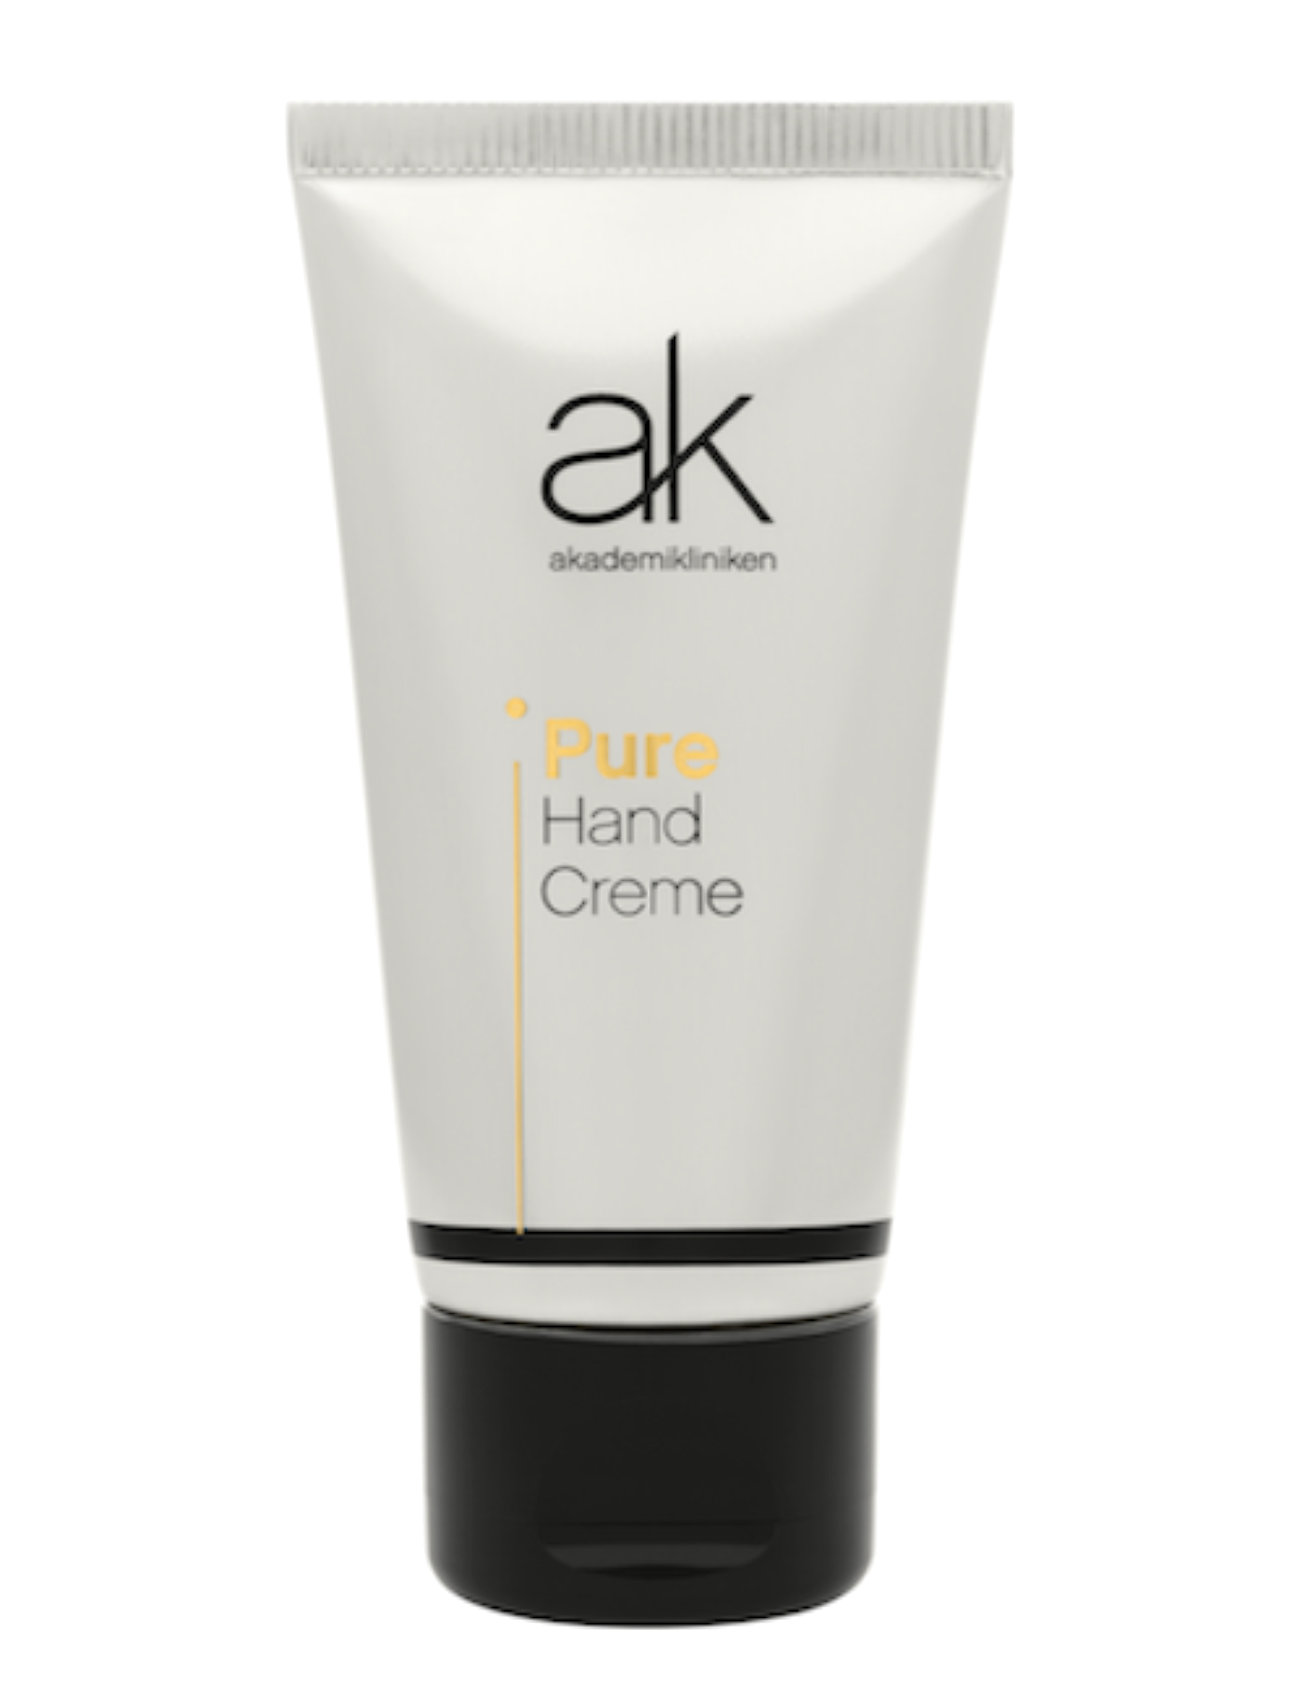 Akademikliniken Skincare Pure Hand Creme - NO COLOUR